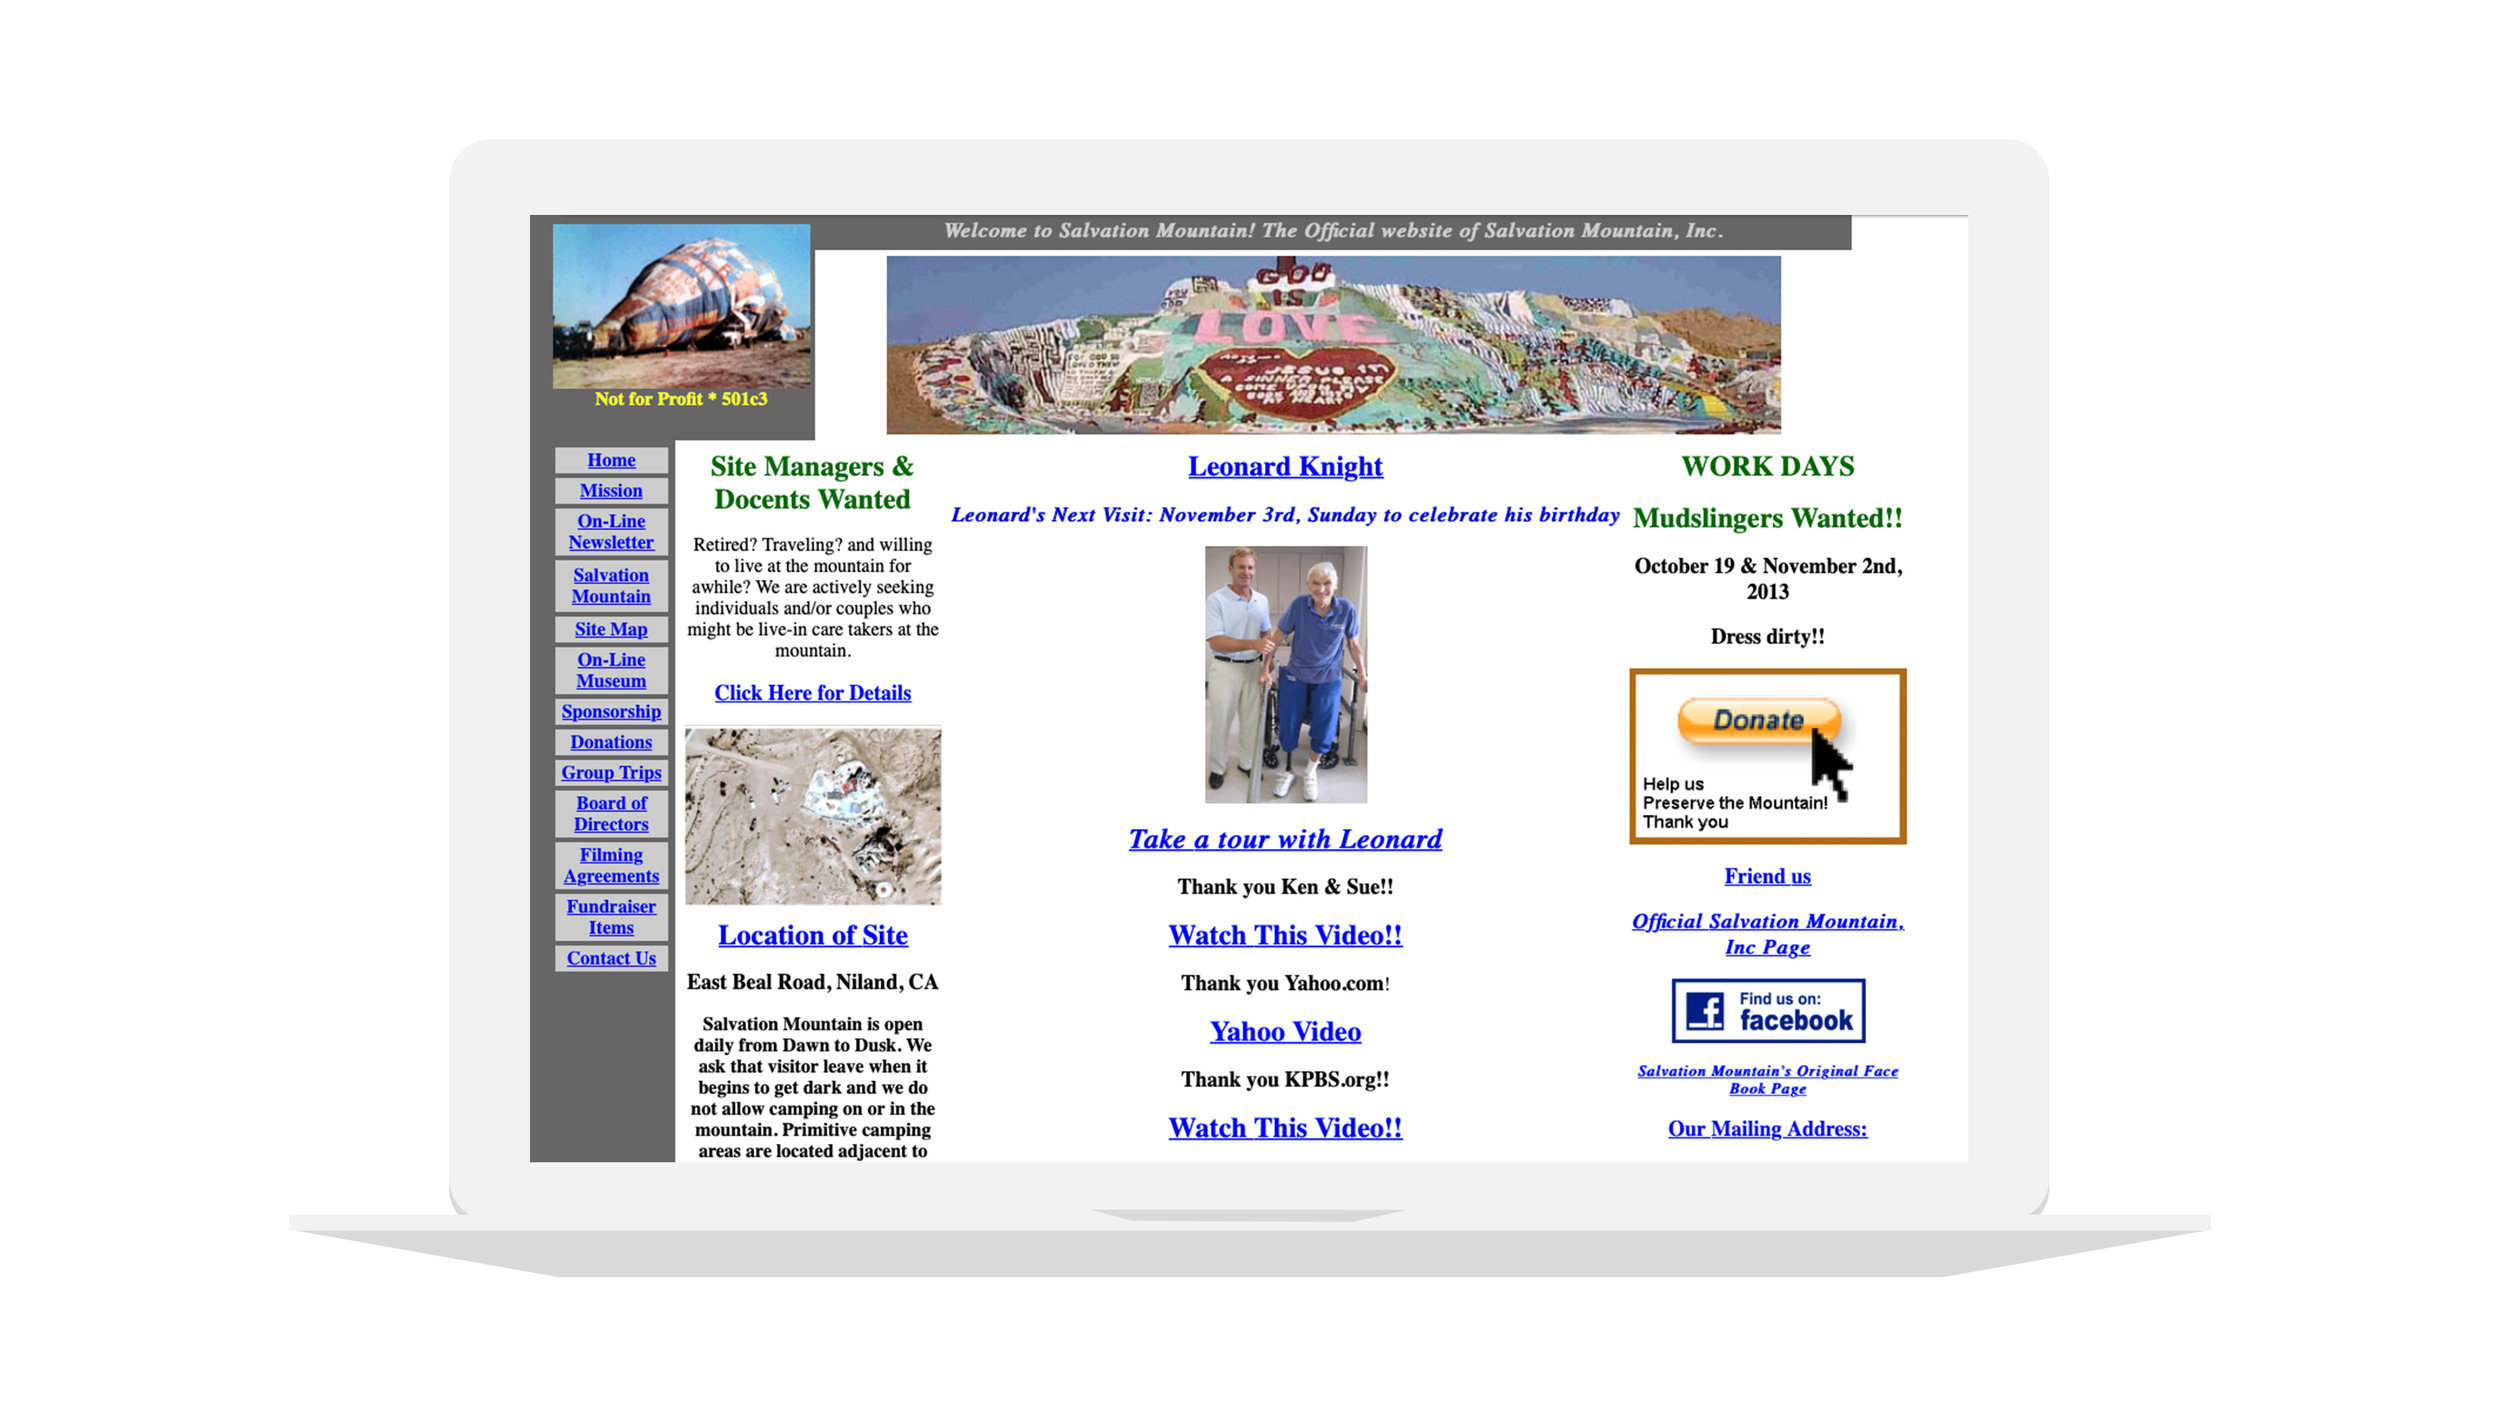 chrissihernandez-salvationMountain-website-before.jpg